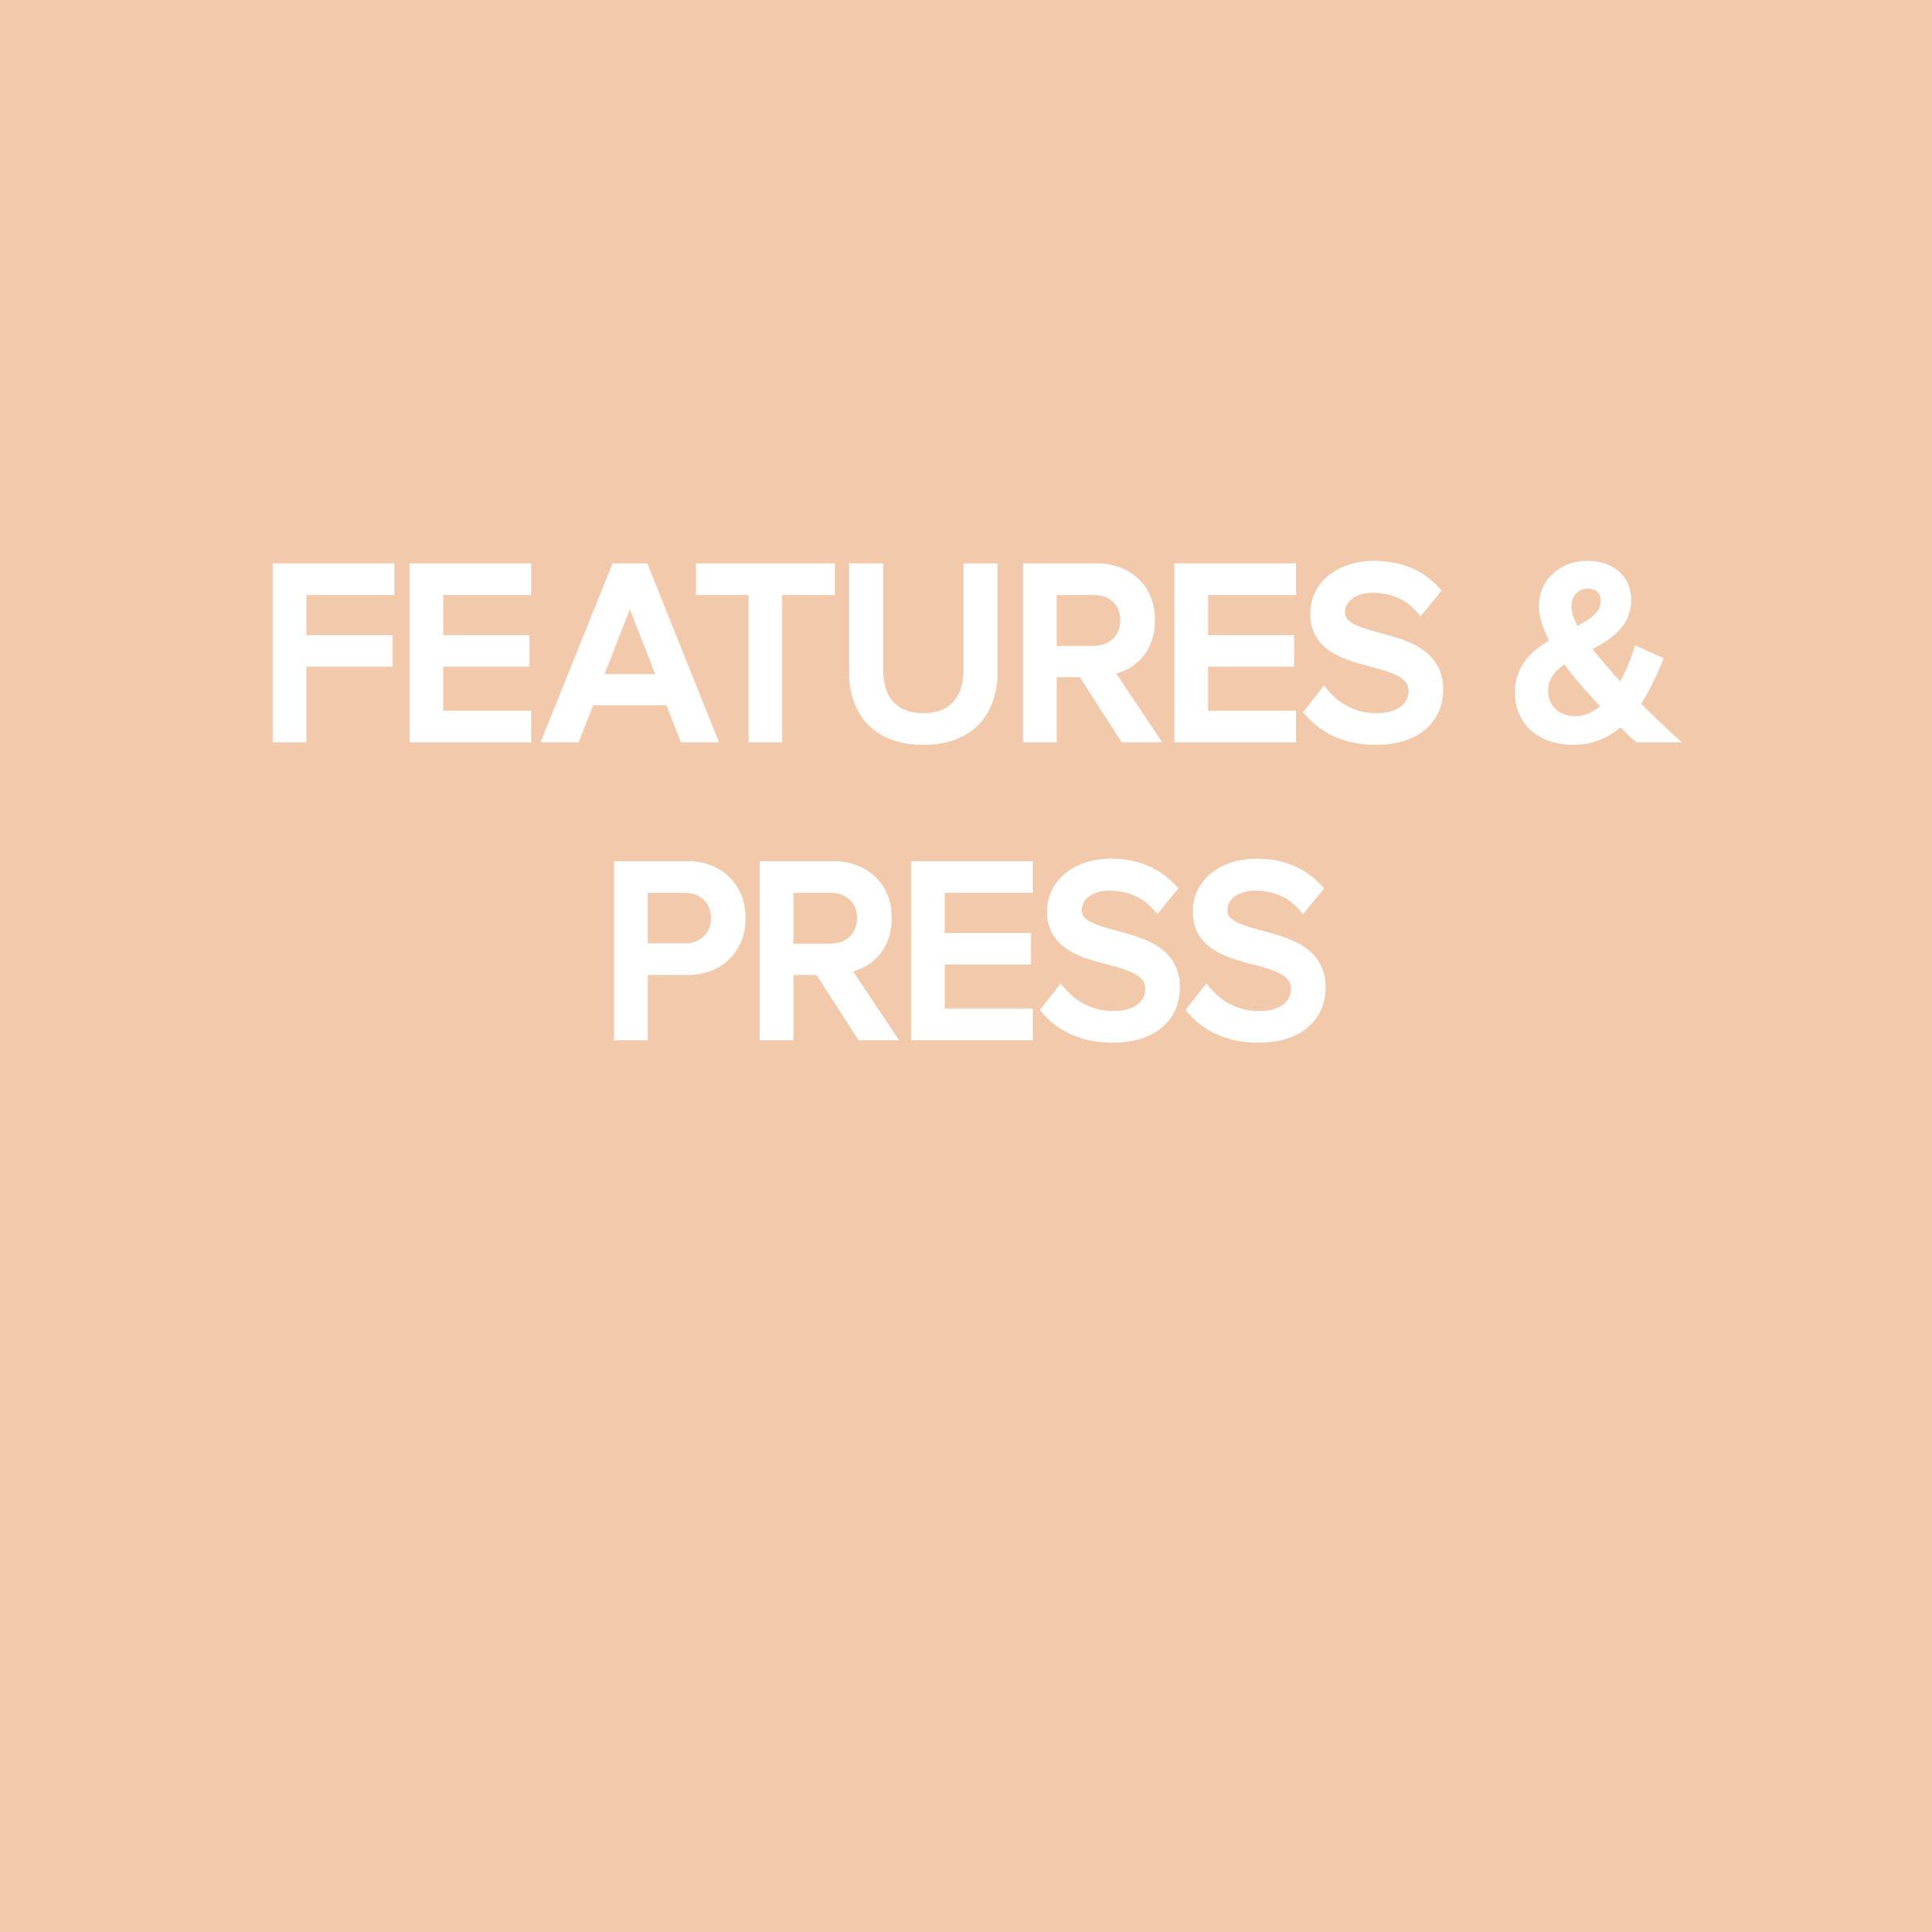 features & press.jpg